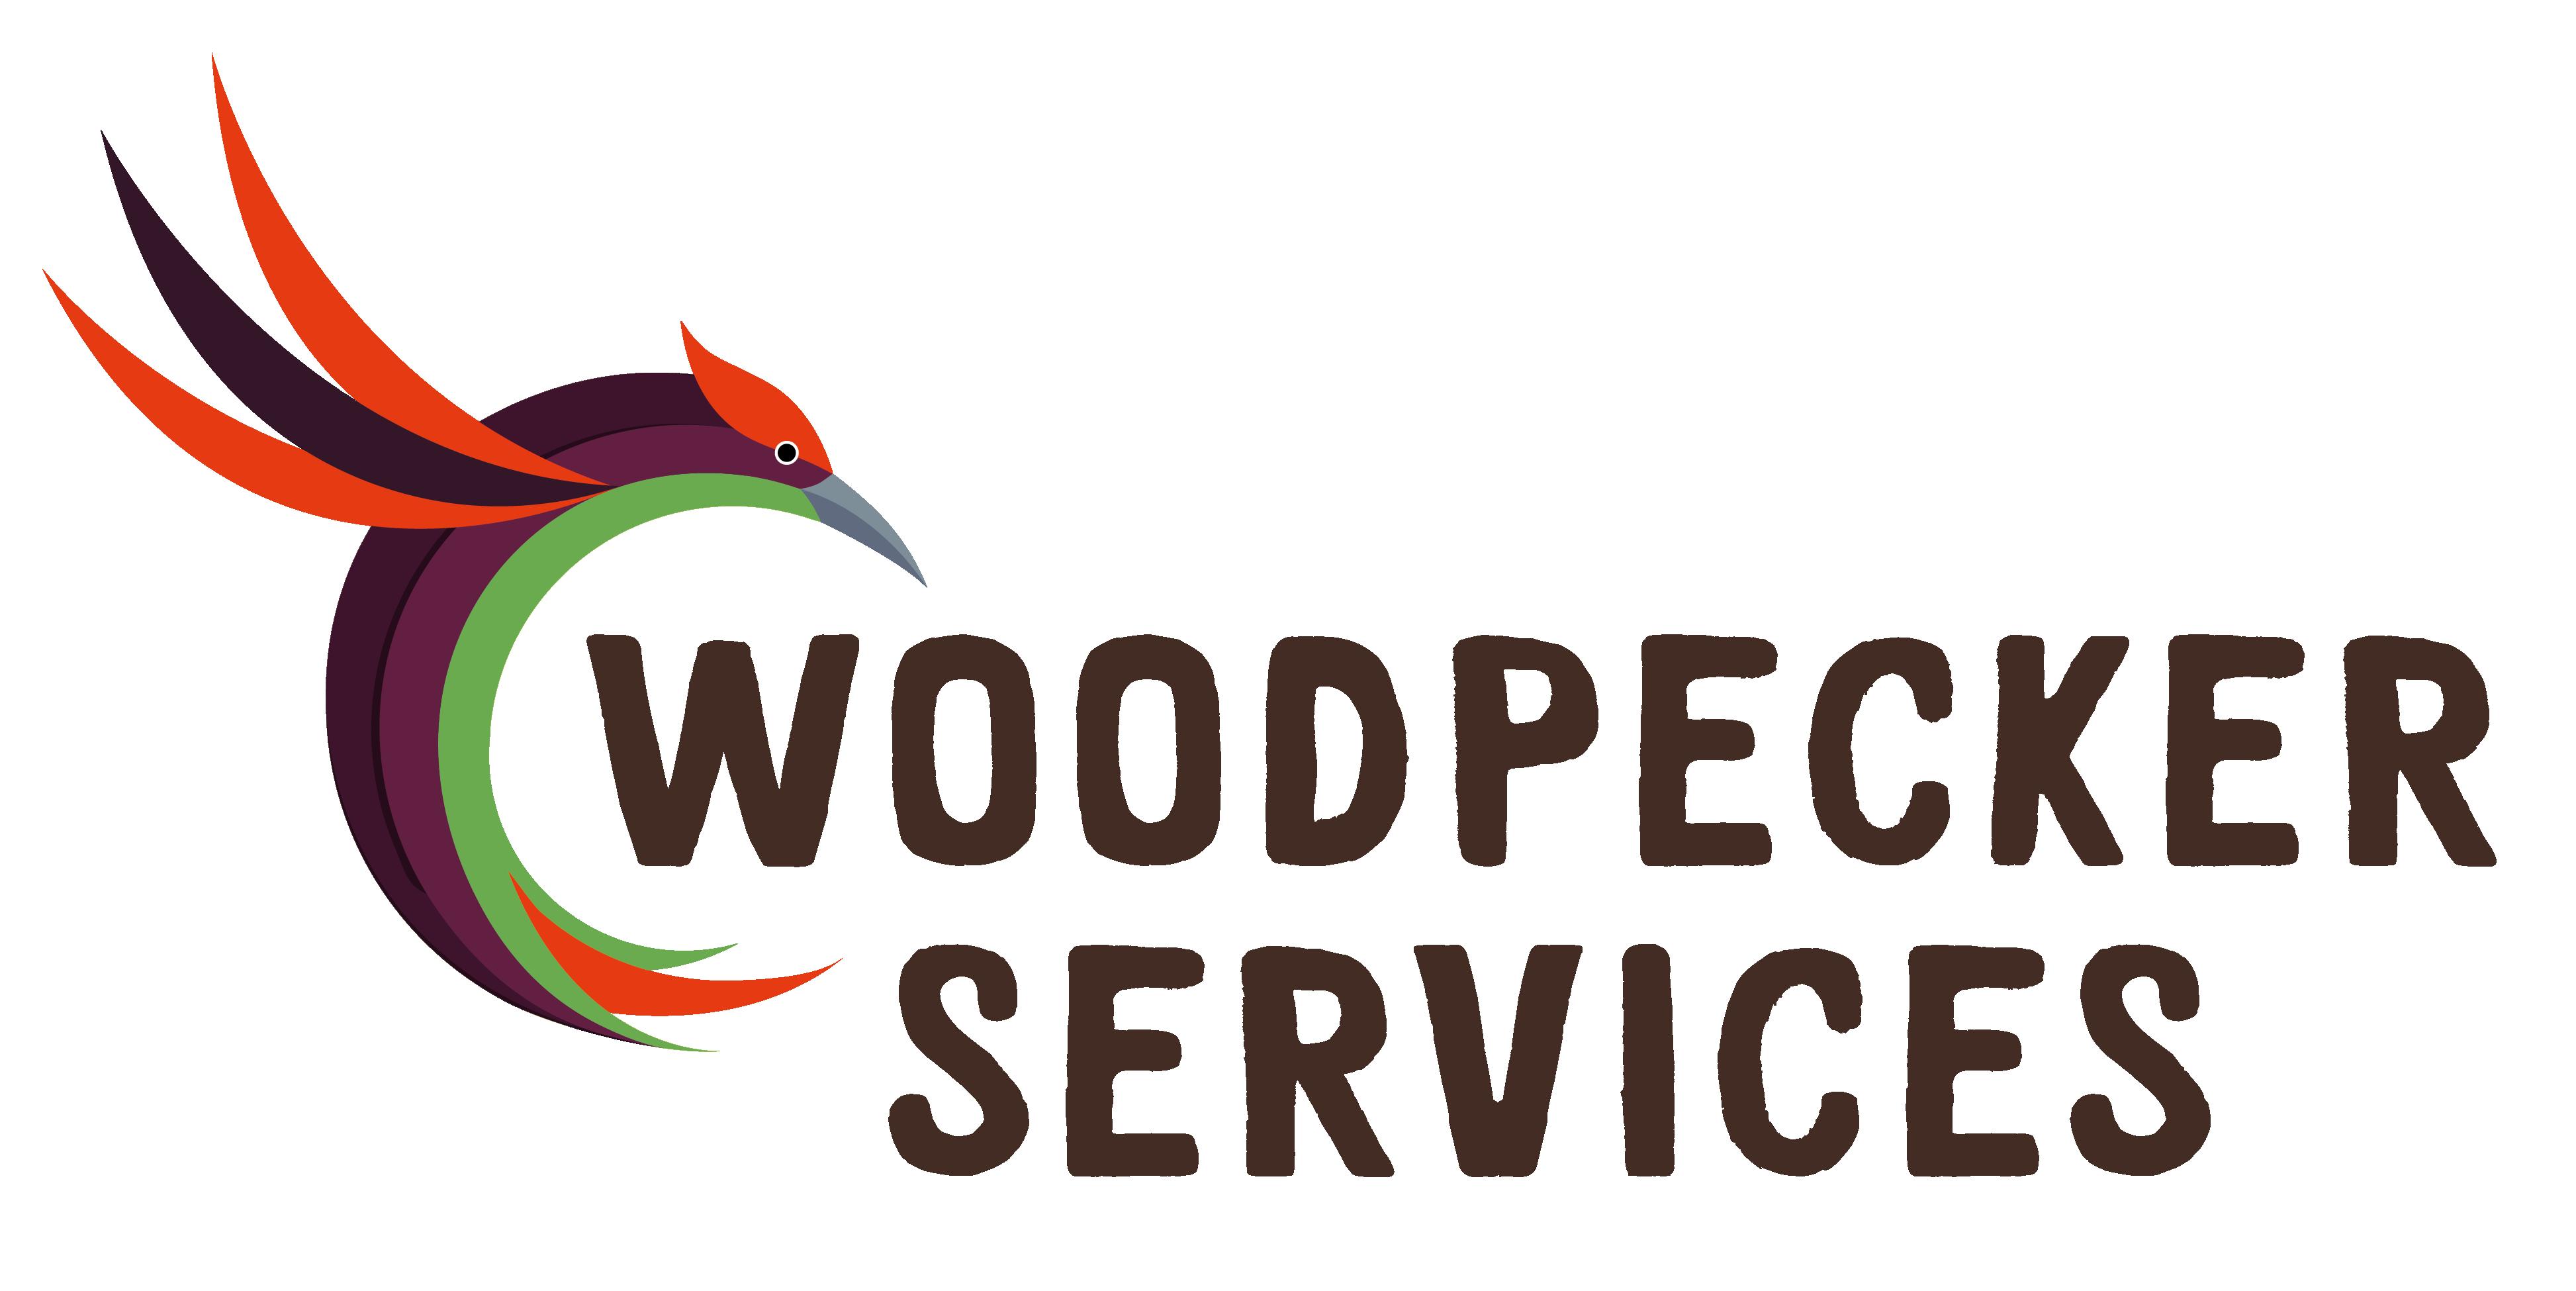 Woodpecker Services